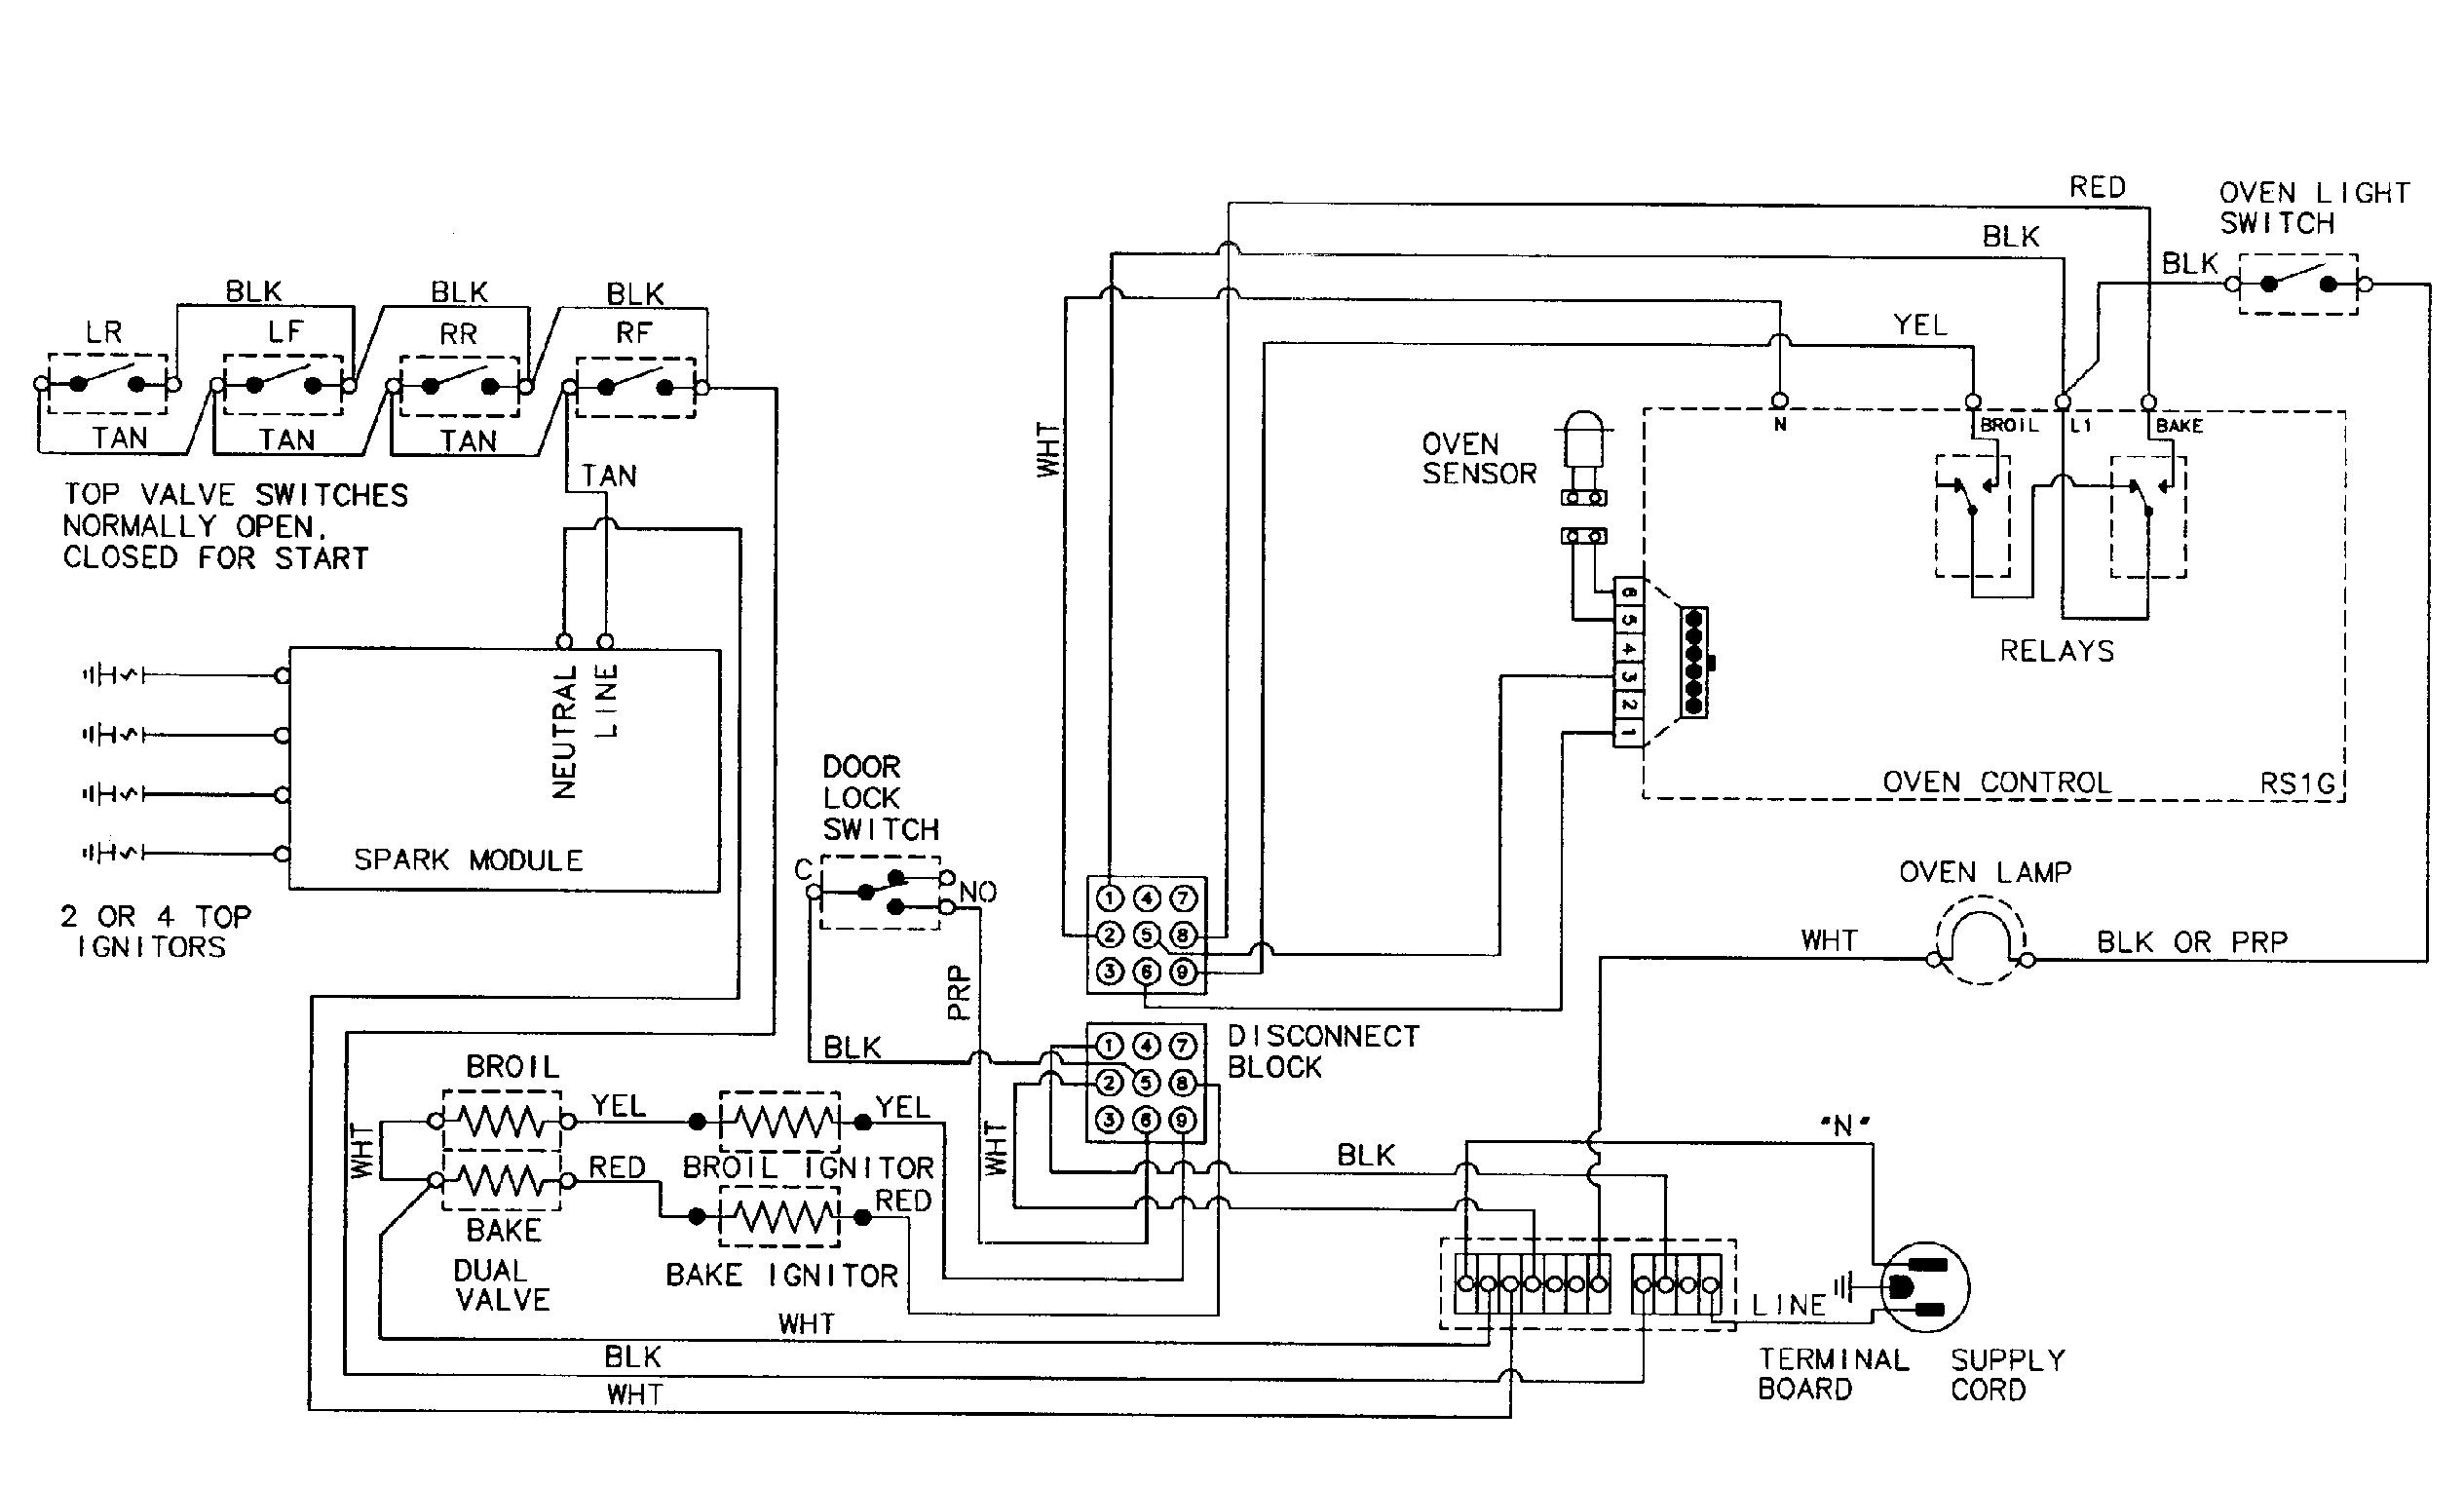 Maytag model MGR5745ADA free standing, gas genuine parts